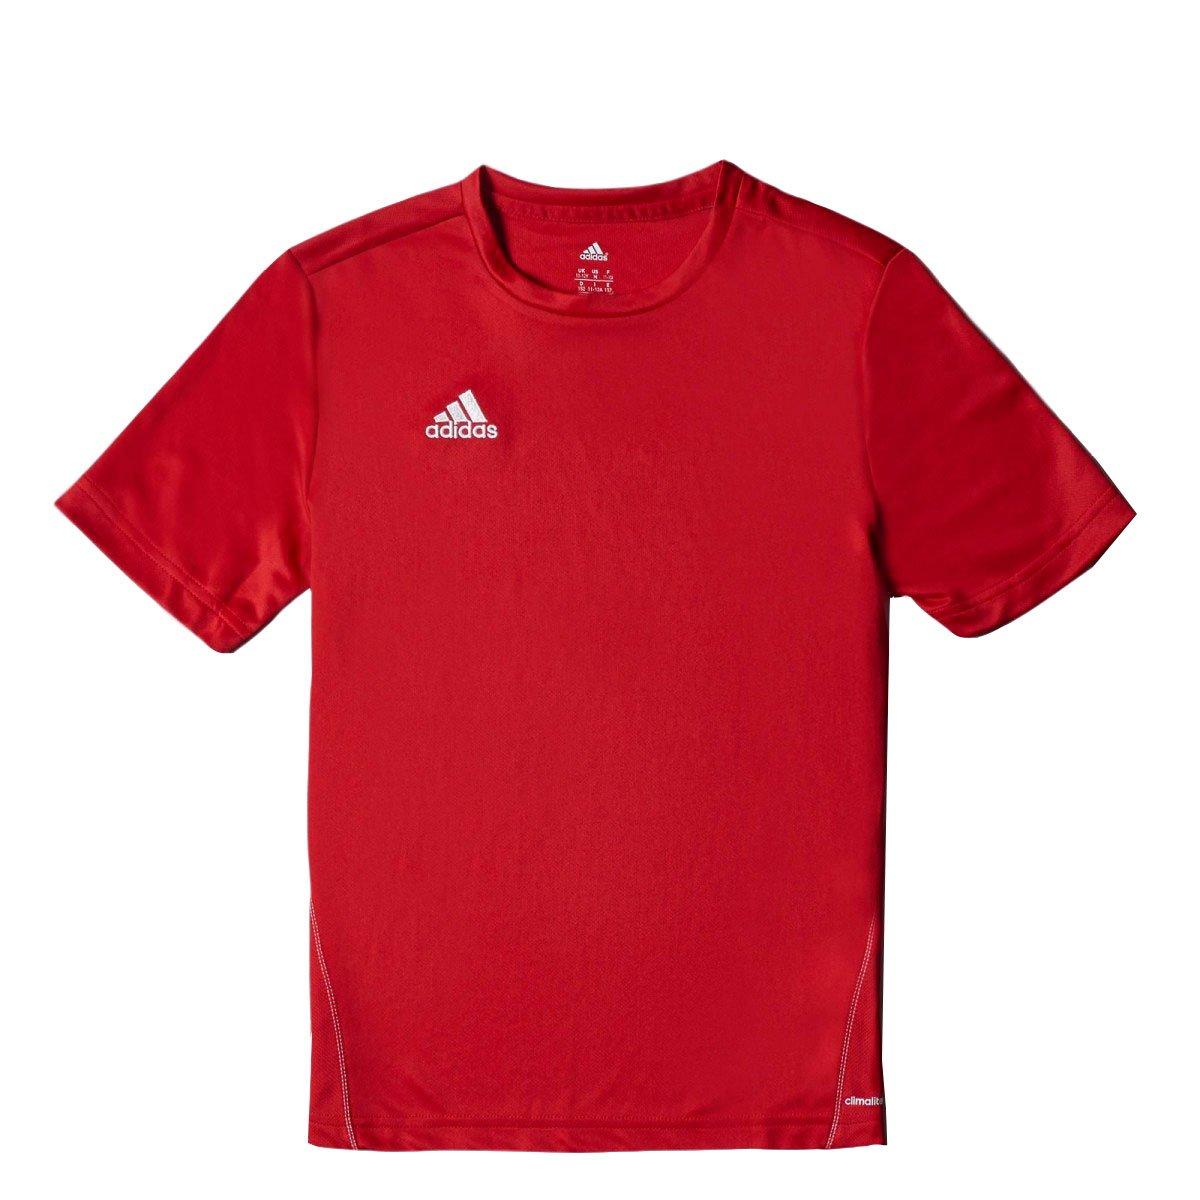 4ec57b806ea Bizz Store - Camiseta Futebol Infantil Menino Adidas Treino Core 15